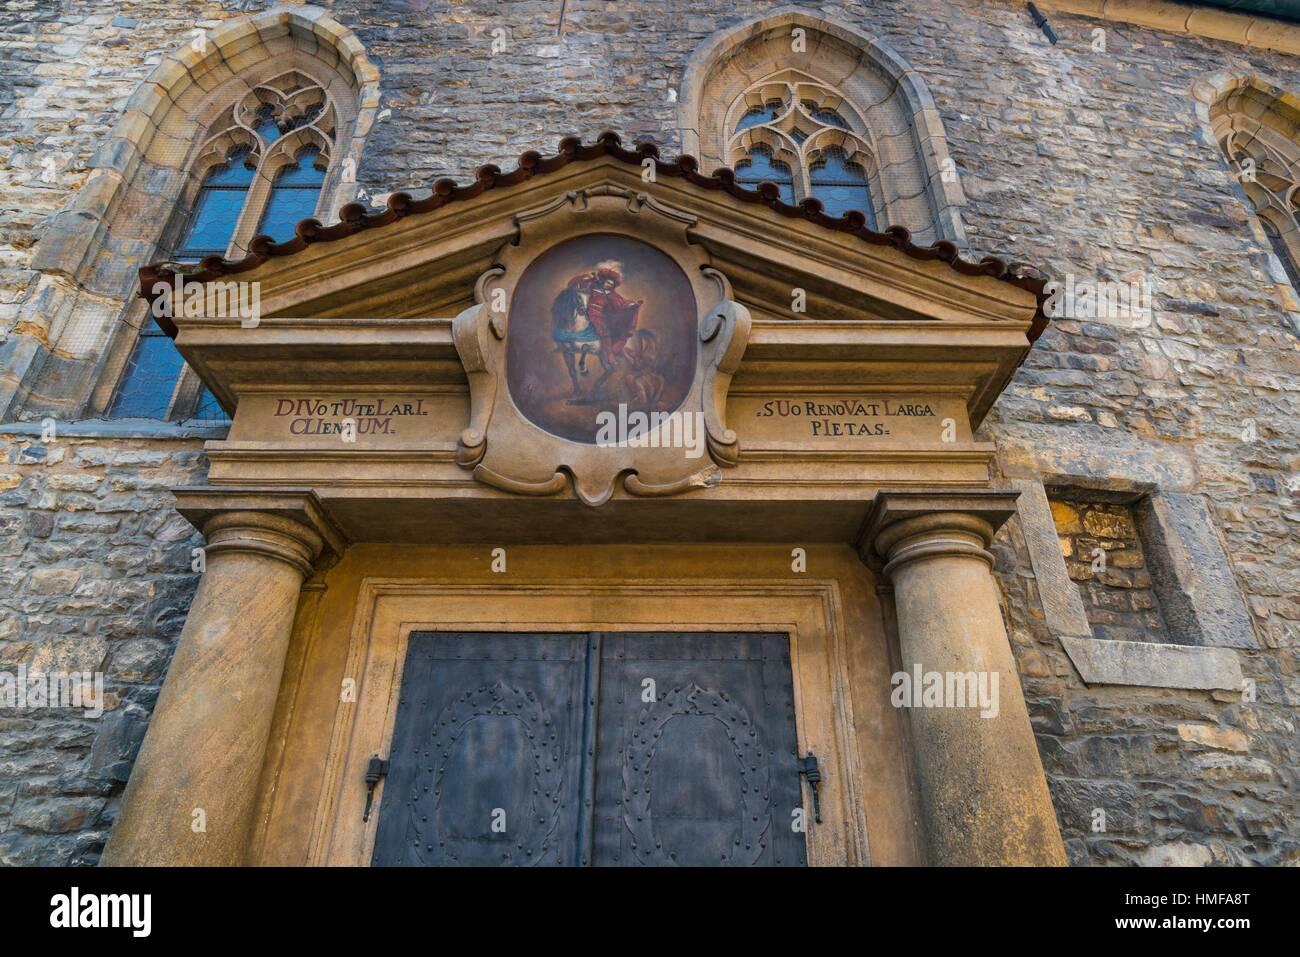 St. Martin in the Wall Church, Kostel sv. Martin ve zdi, Prague, Czech Republic, Europe. Stock Photo